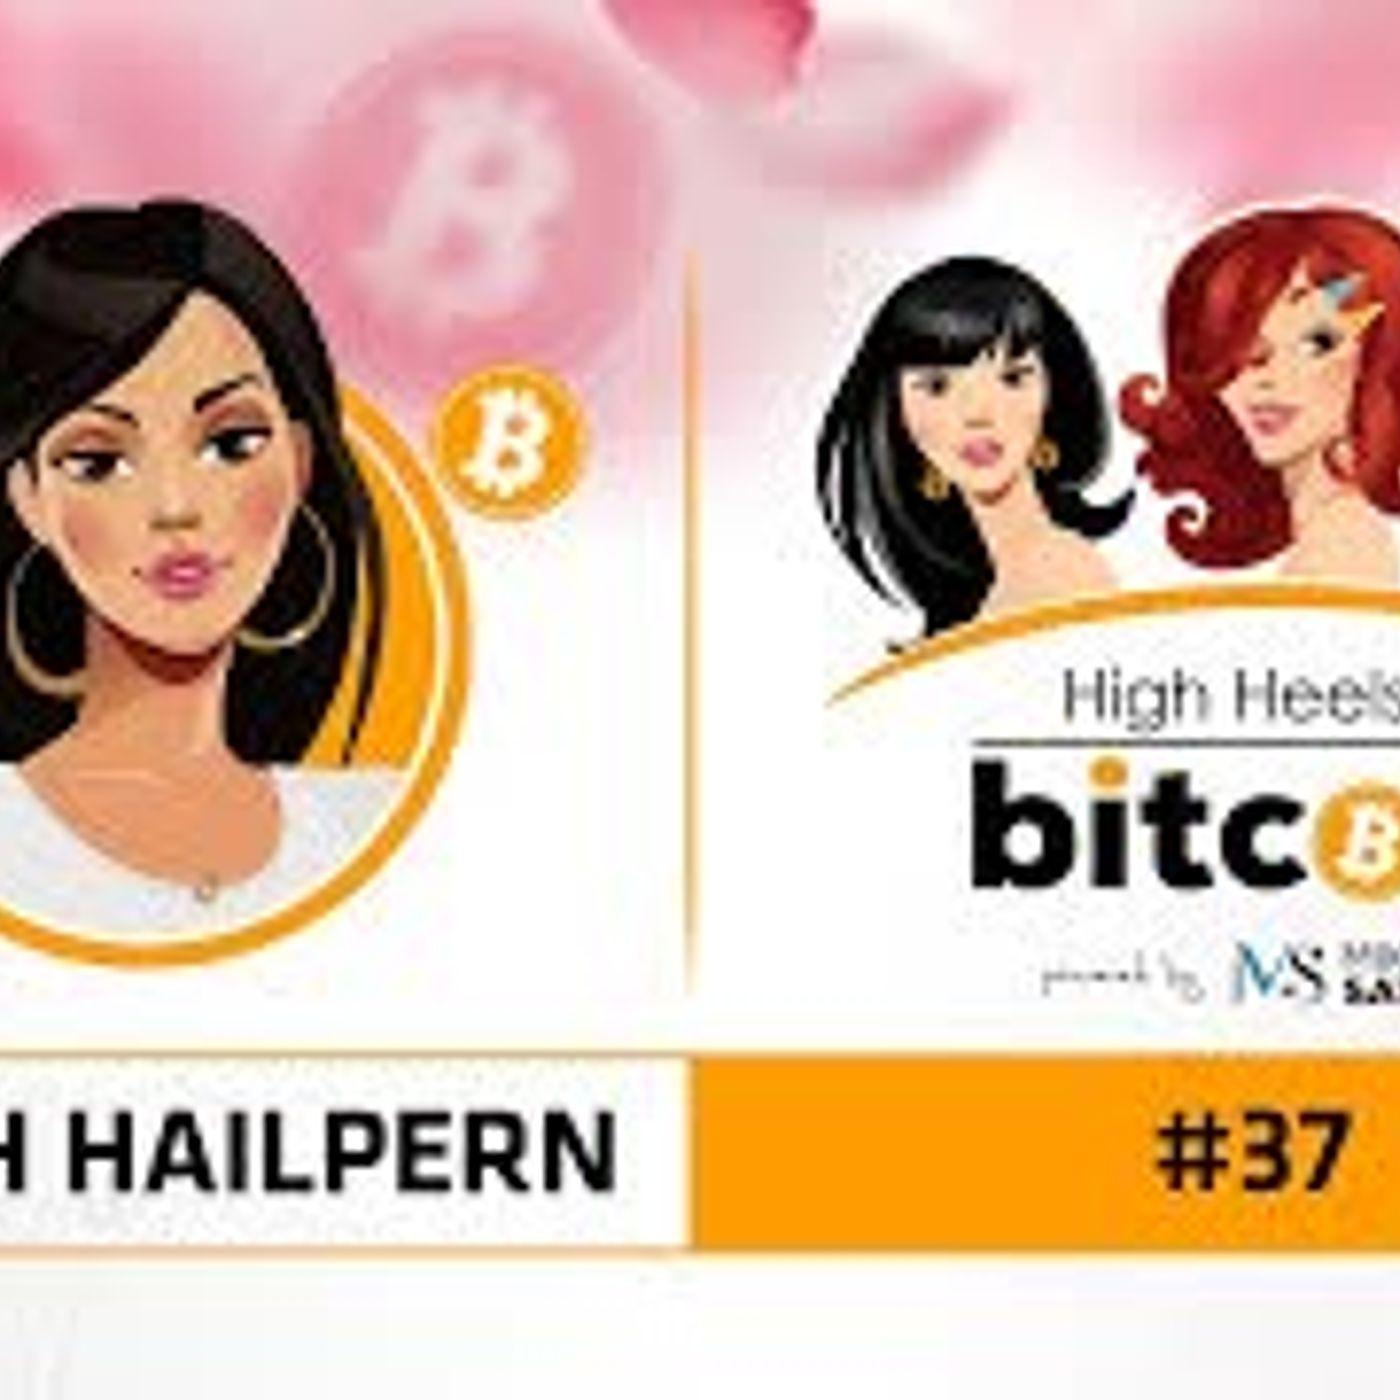 High Heels of Bitcoin #37 | Layah Heilpern